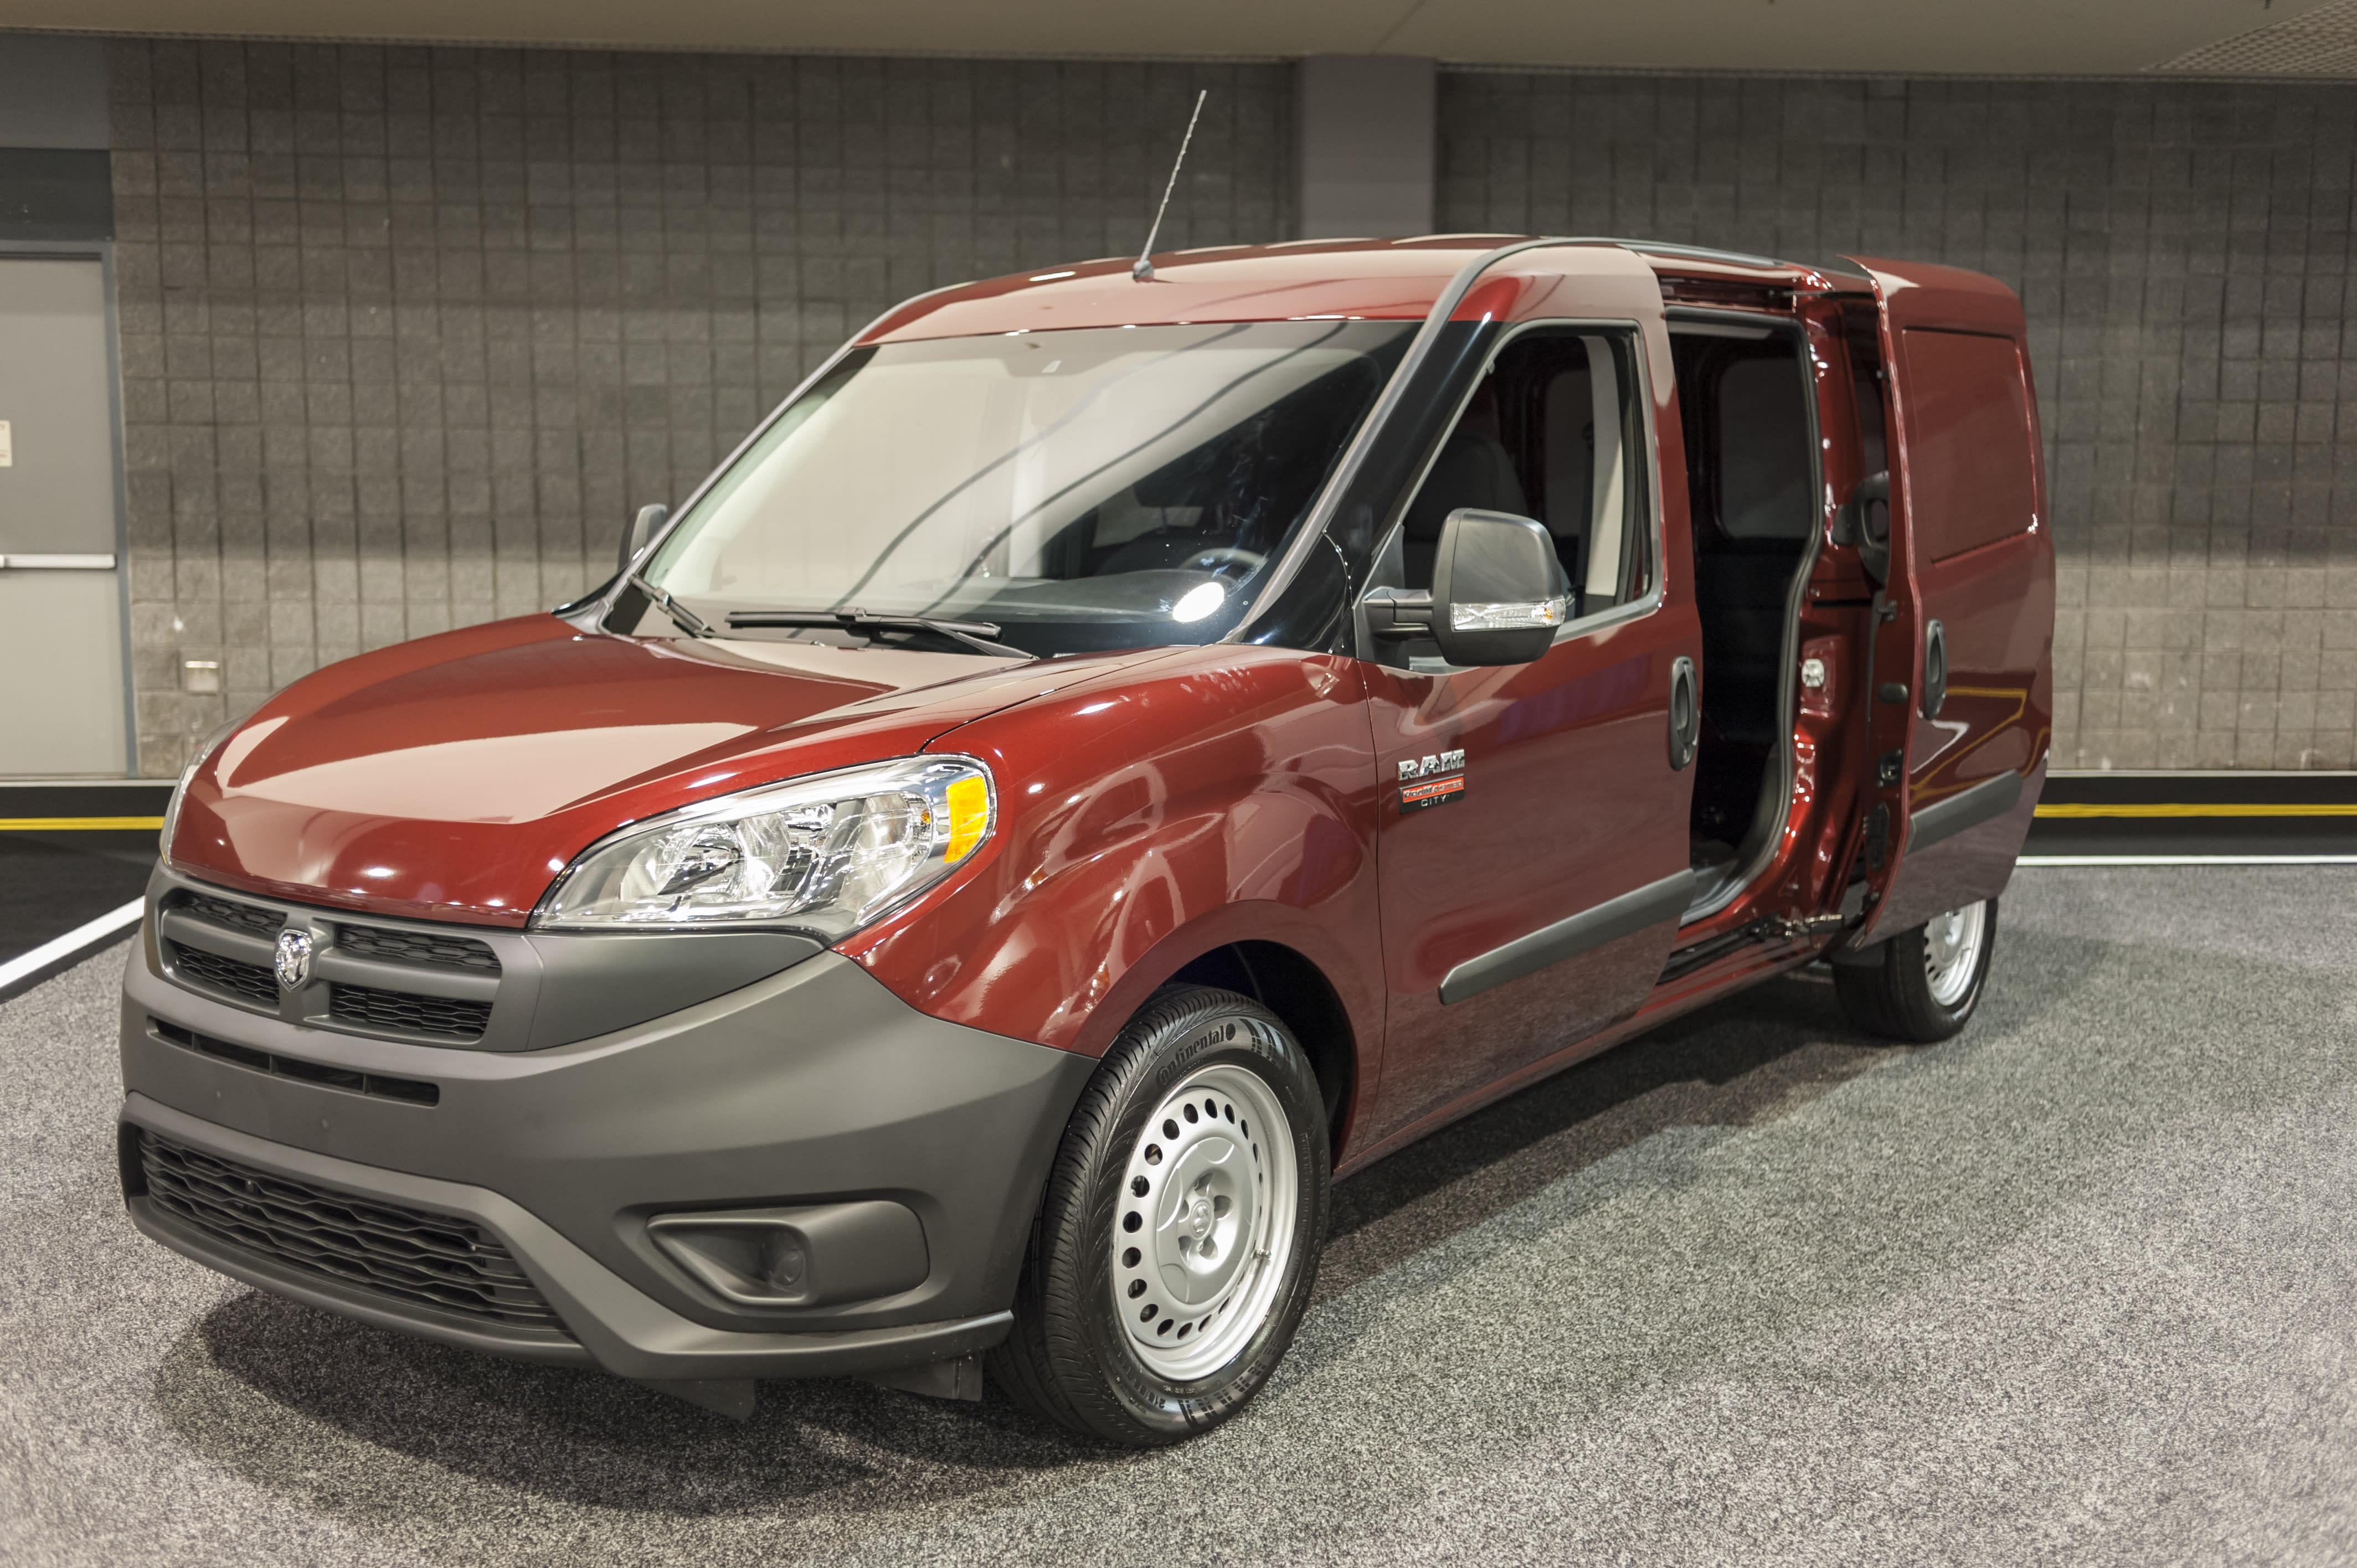 Fiat-Chrysler Recalling Ram ProMaster Delivery Vans